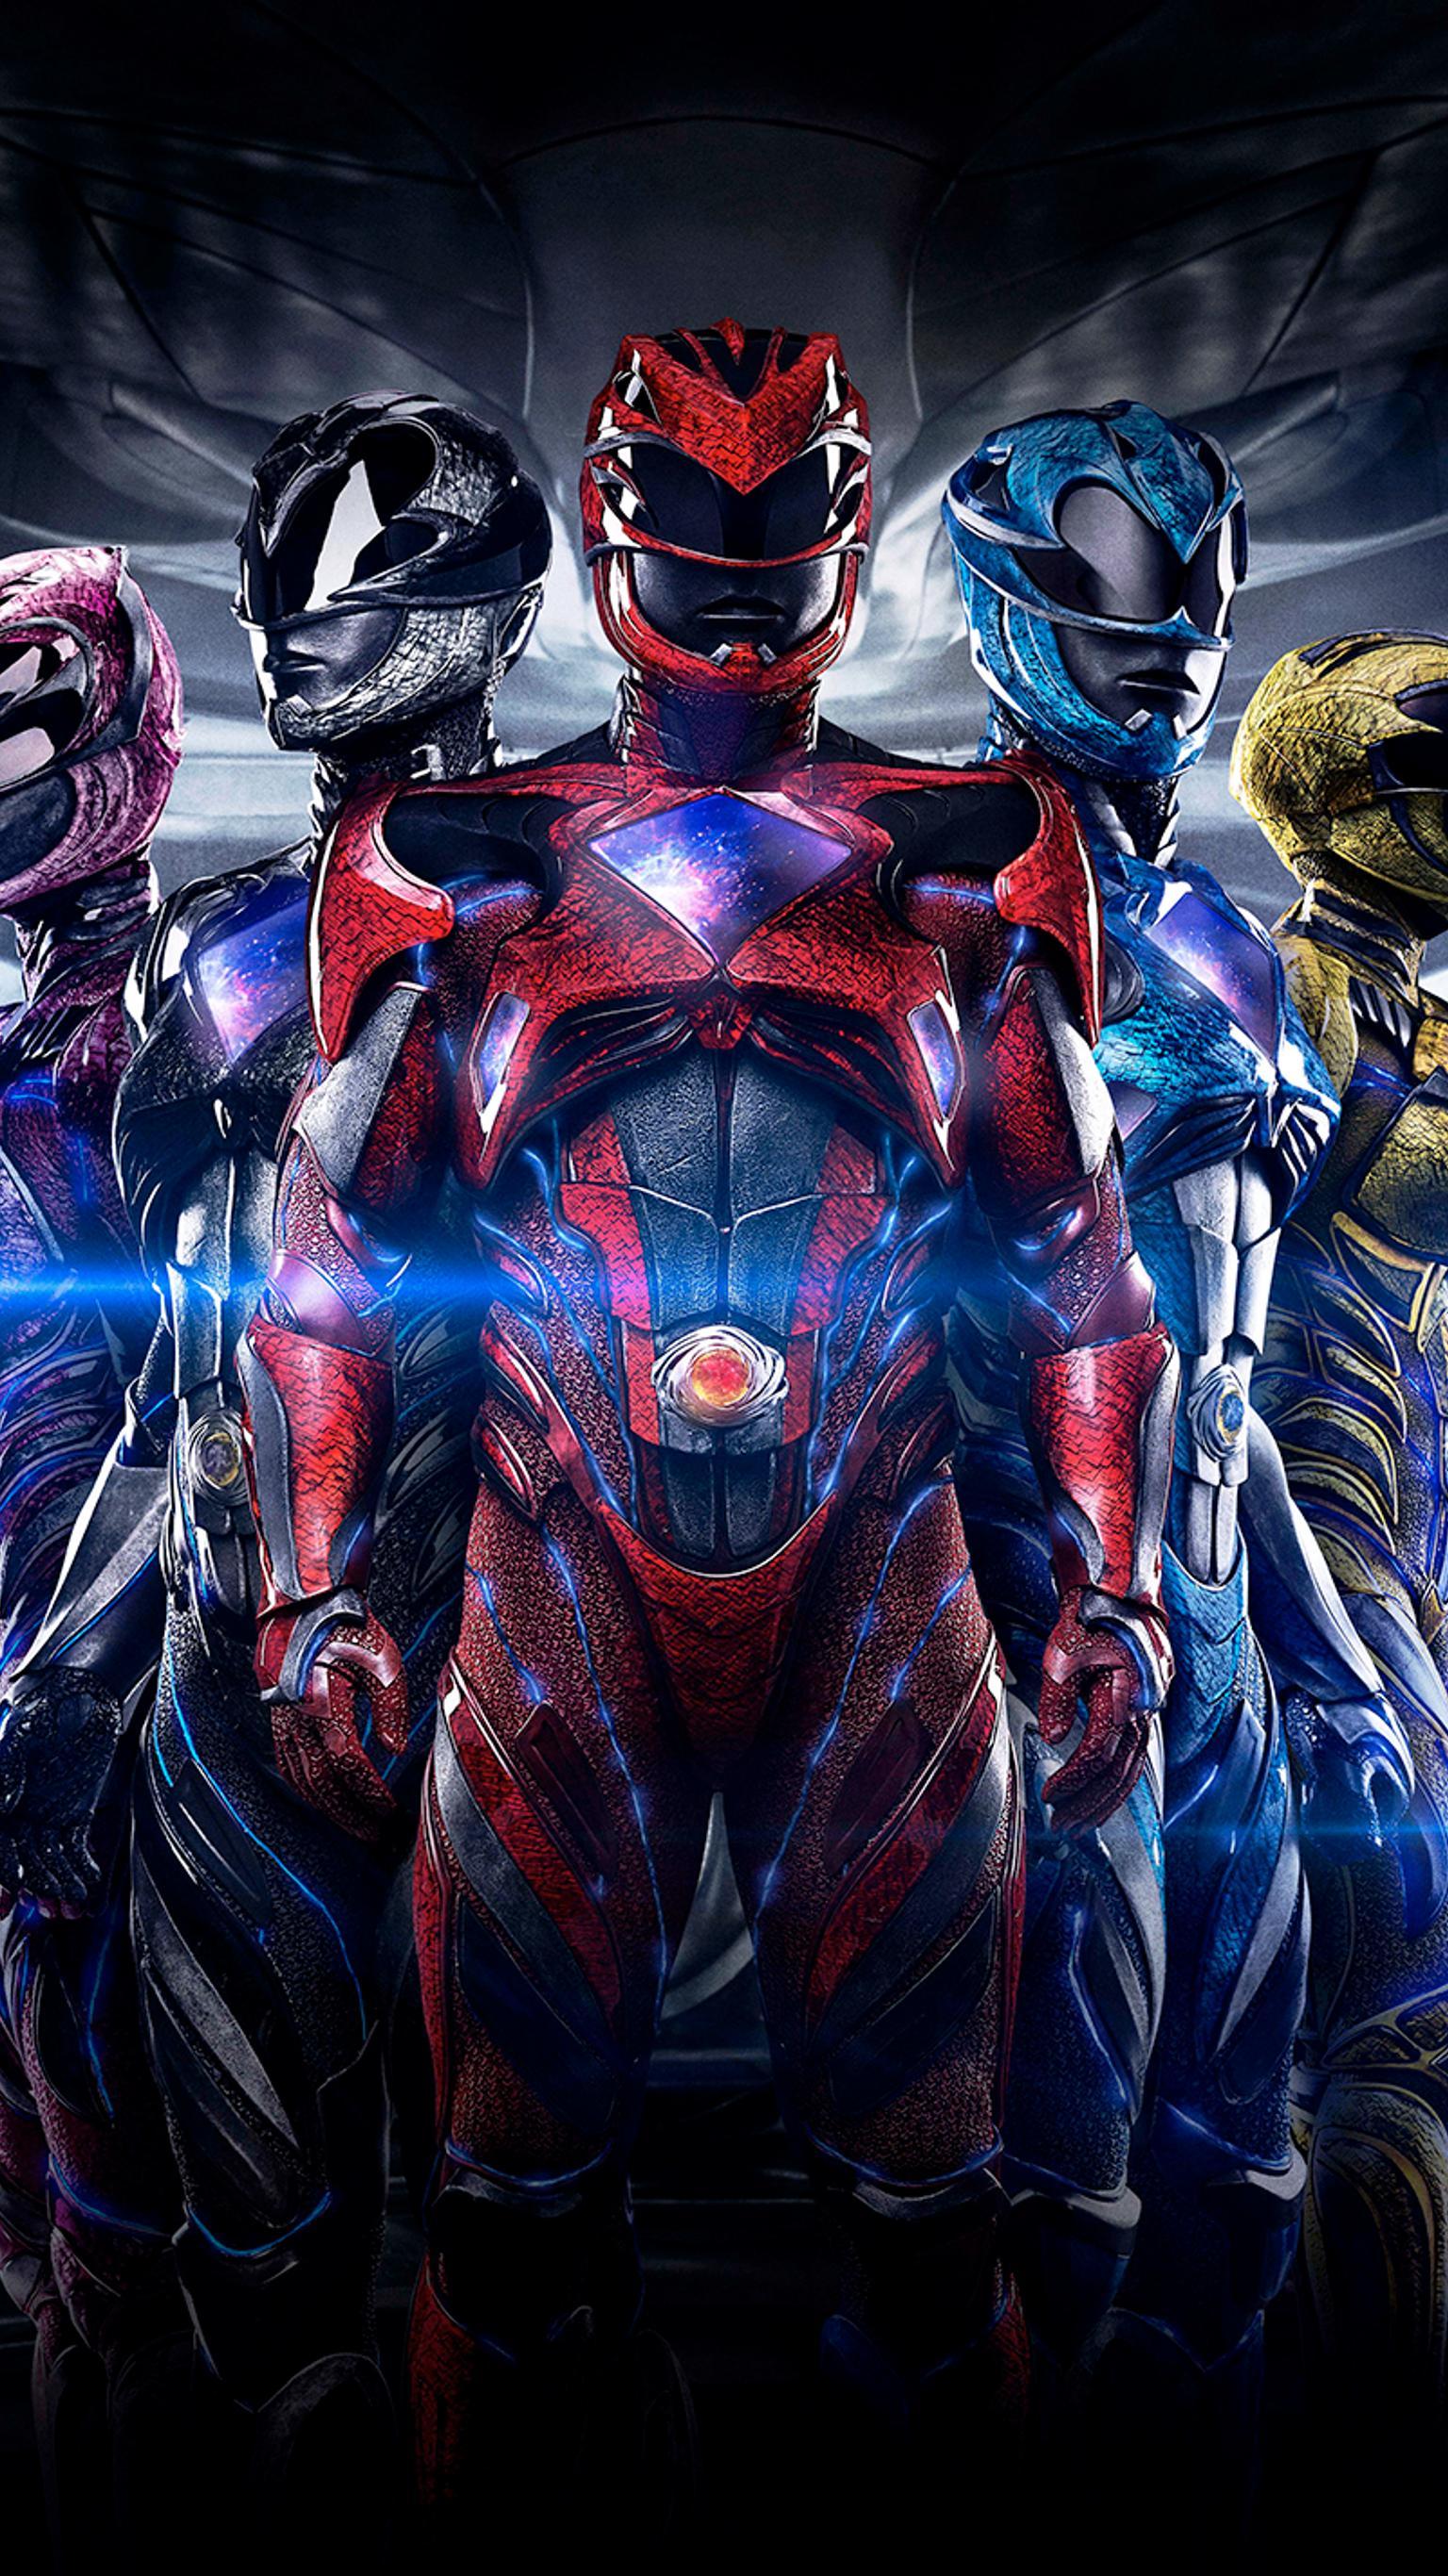 Power Rangers 2017 Phone Wallpapers Moviemania 1536x2732